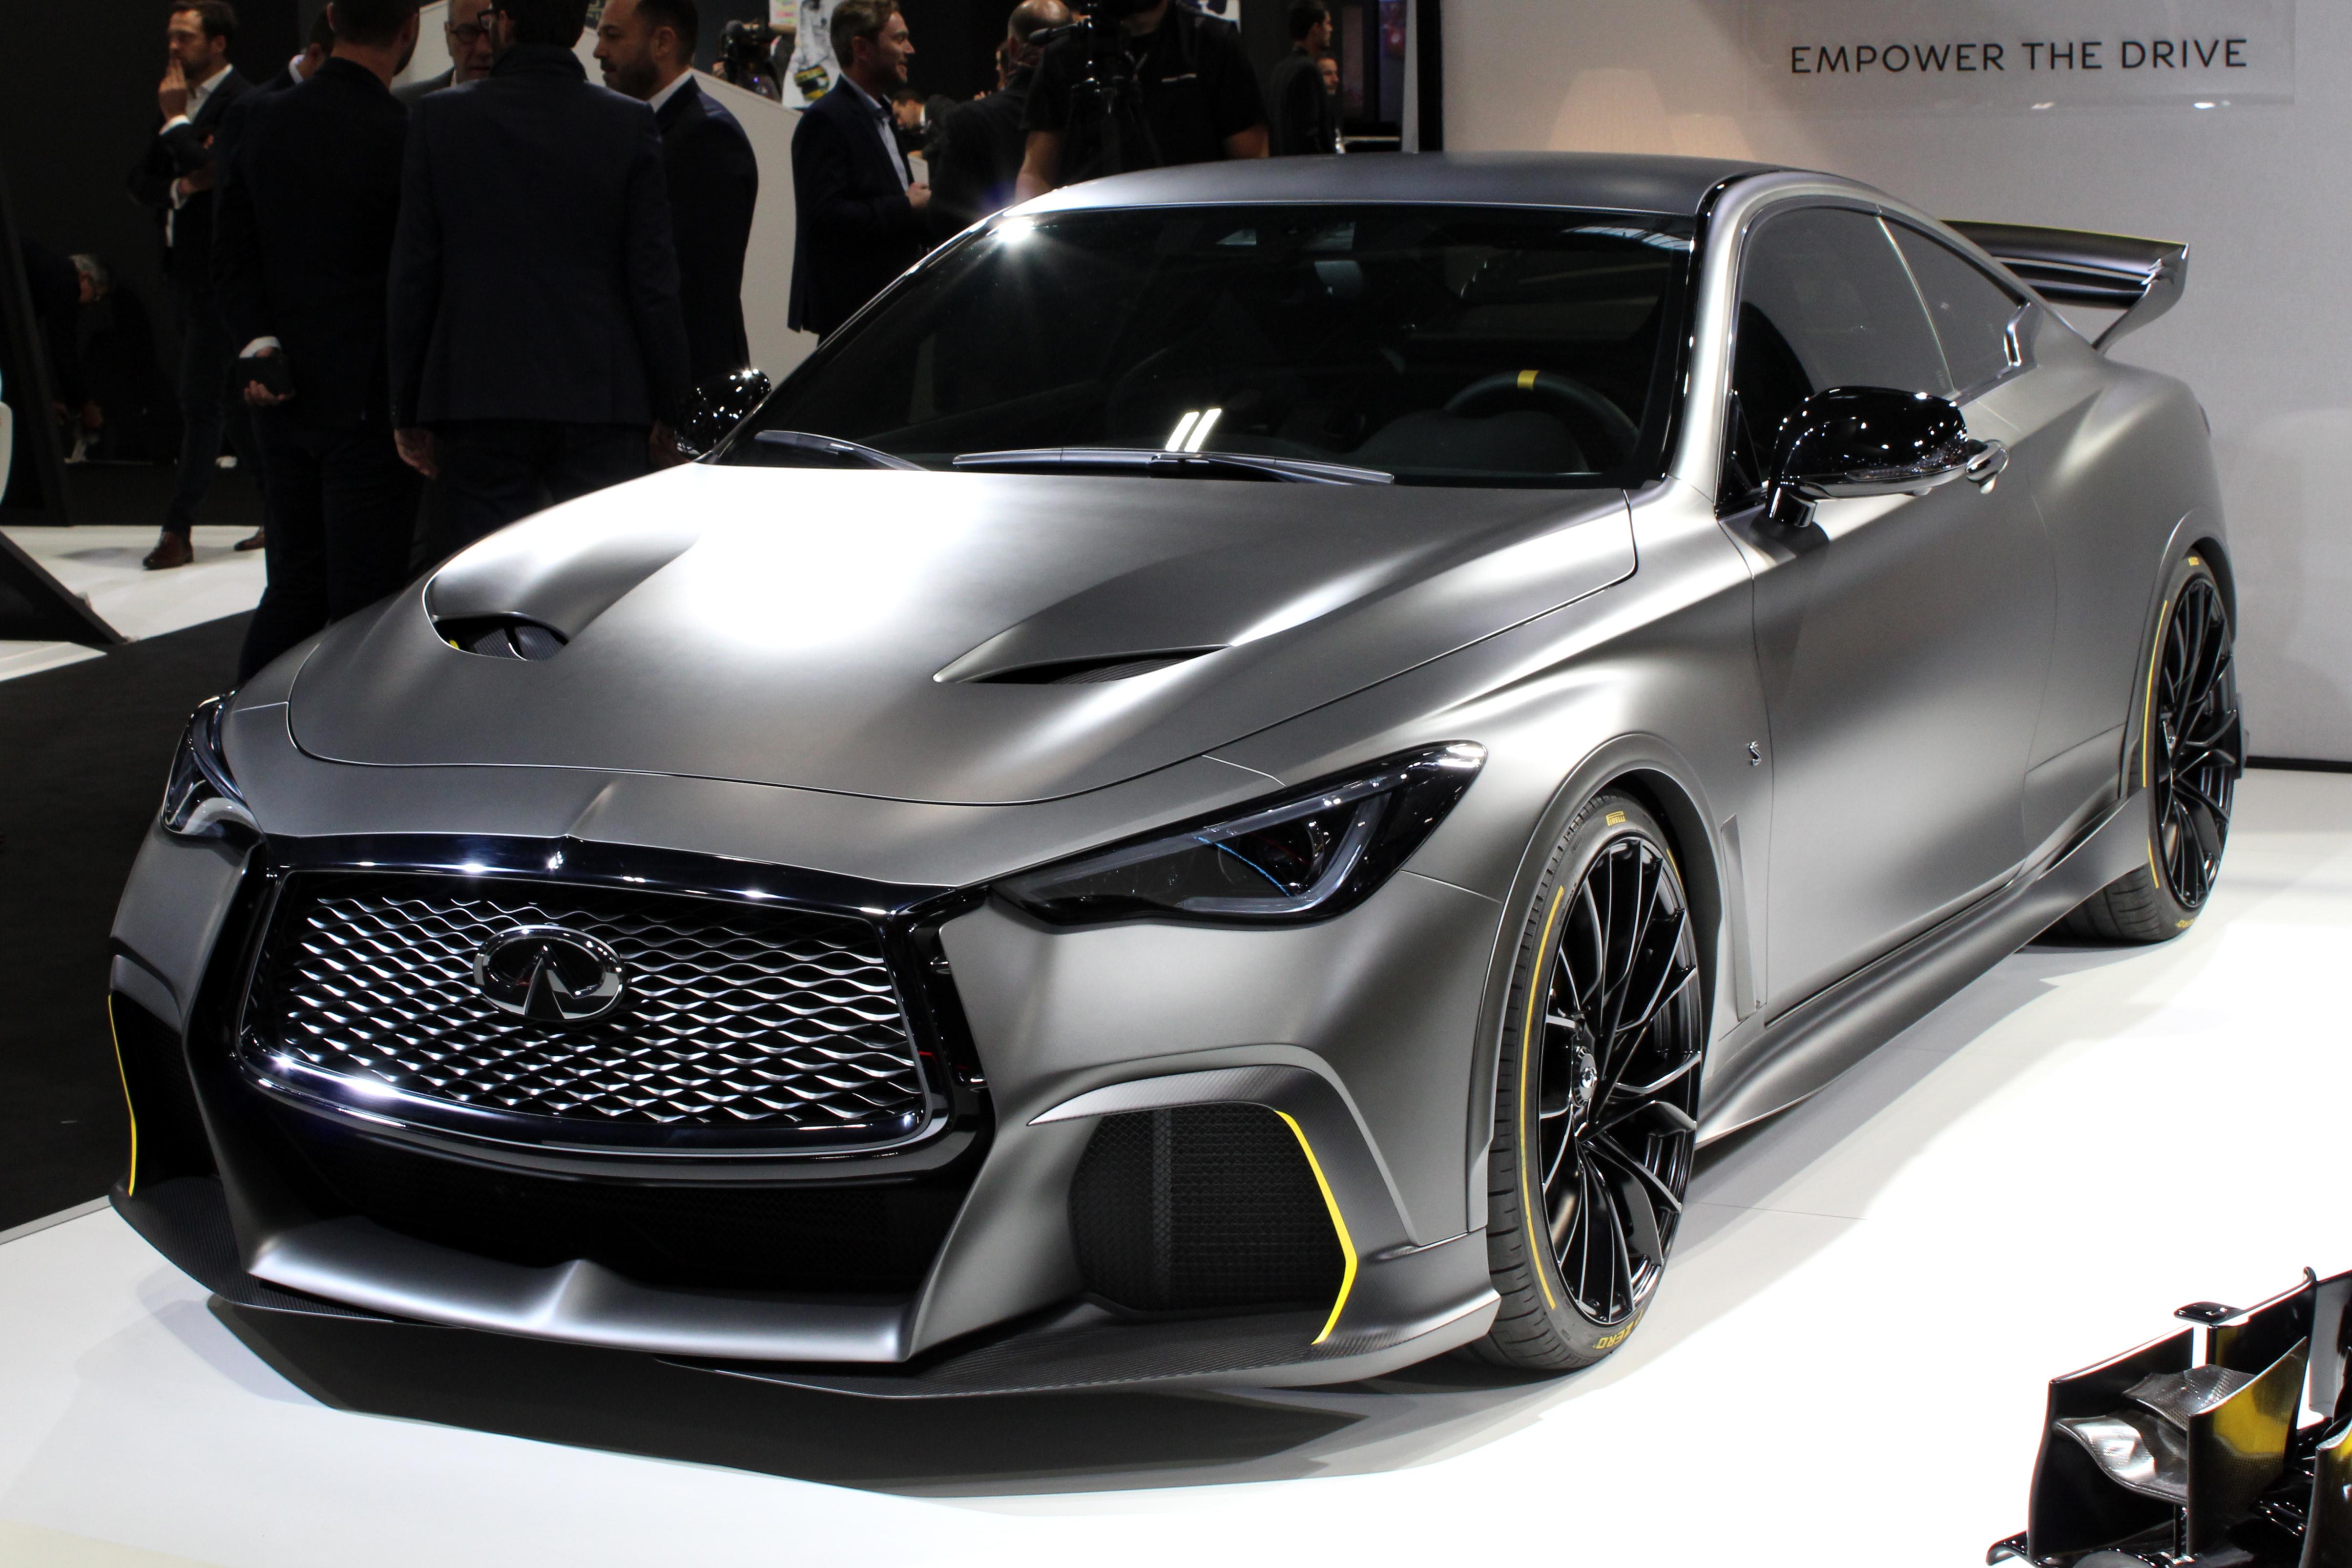 File:Infiniti Q60 Project Black S, Paris Motor Show 2018 ...